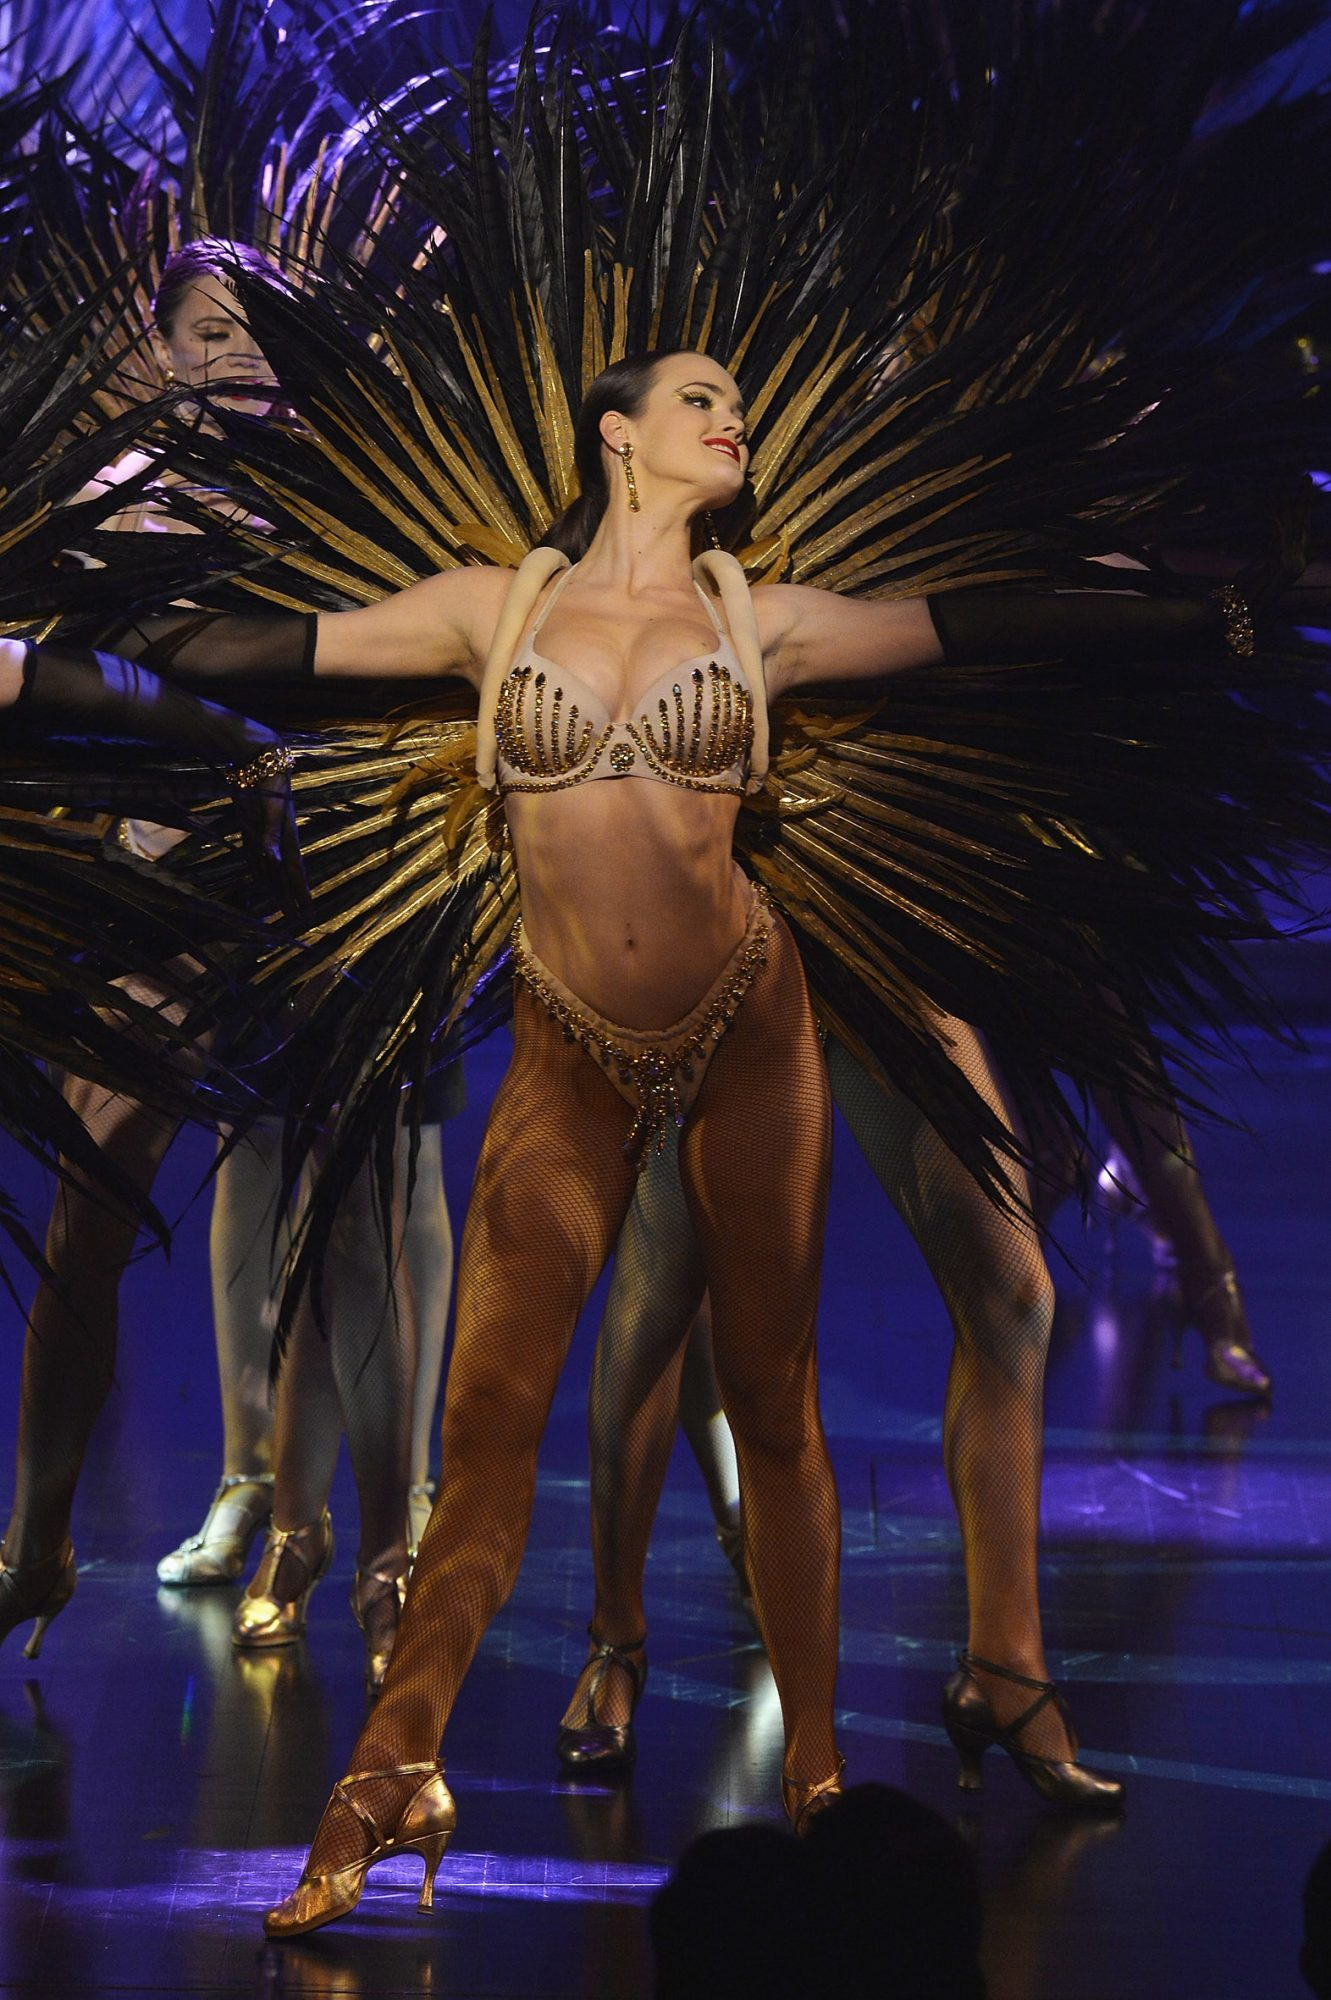 'Paris Merveilles' Lido New Revue : The Show At Opening Gala In Paris